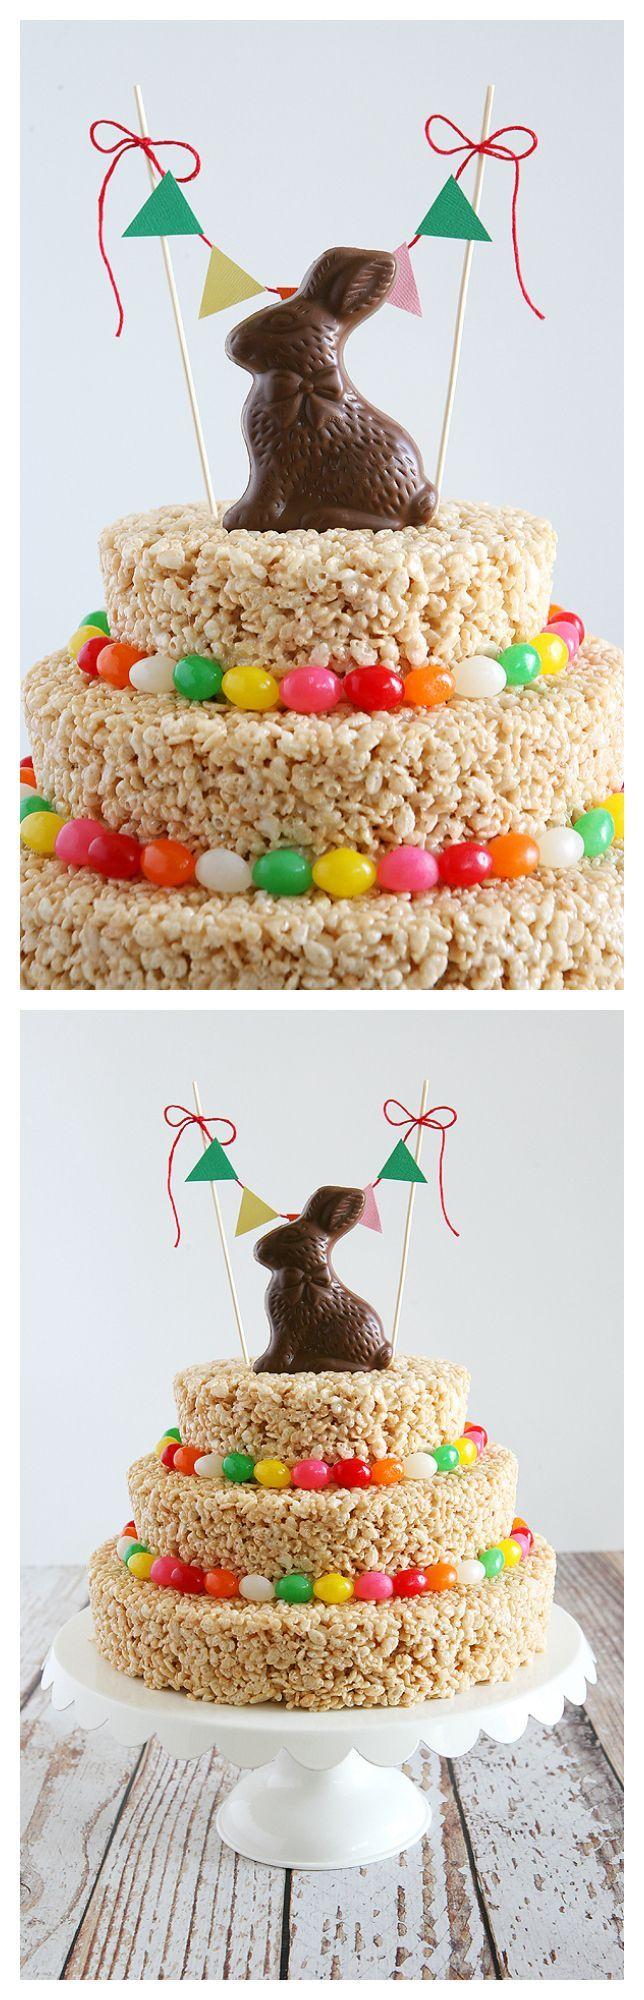 Easter Rice Krispies Treat Cake   Easter Treats